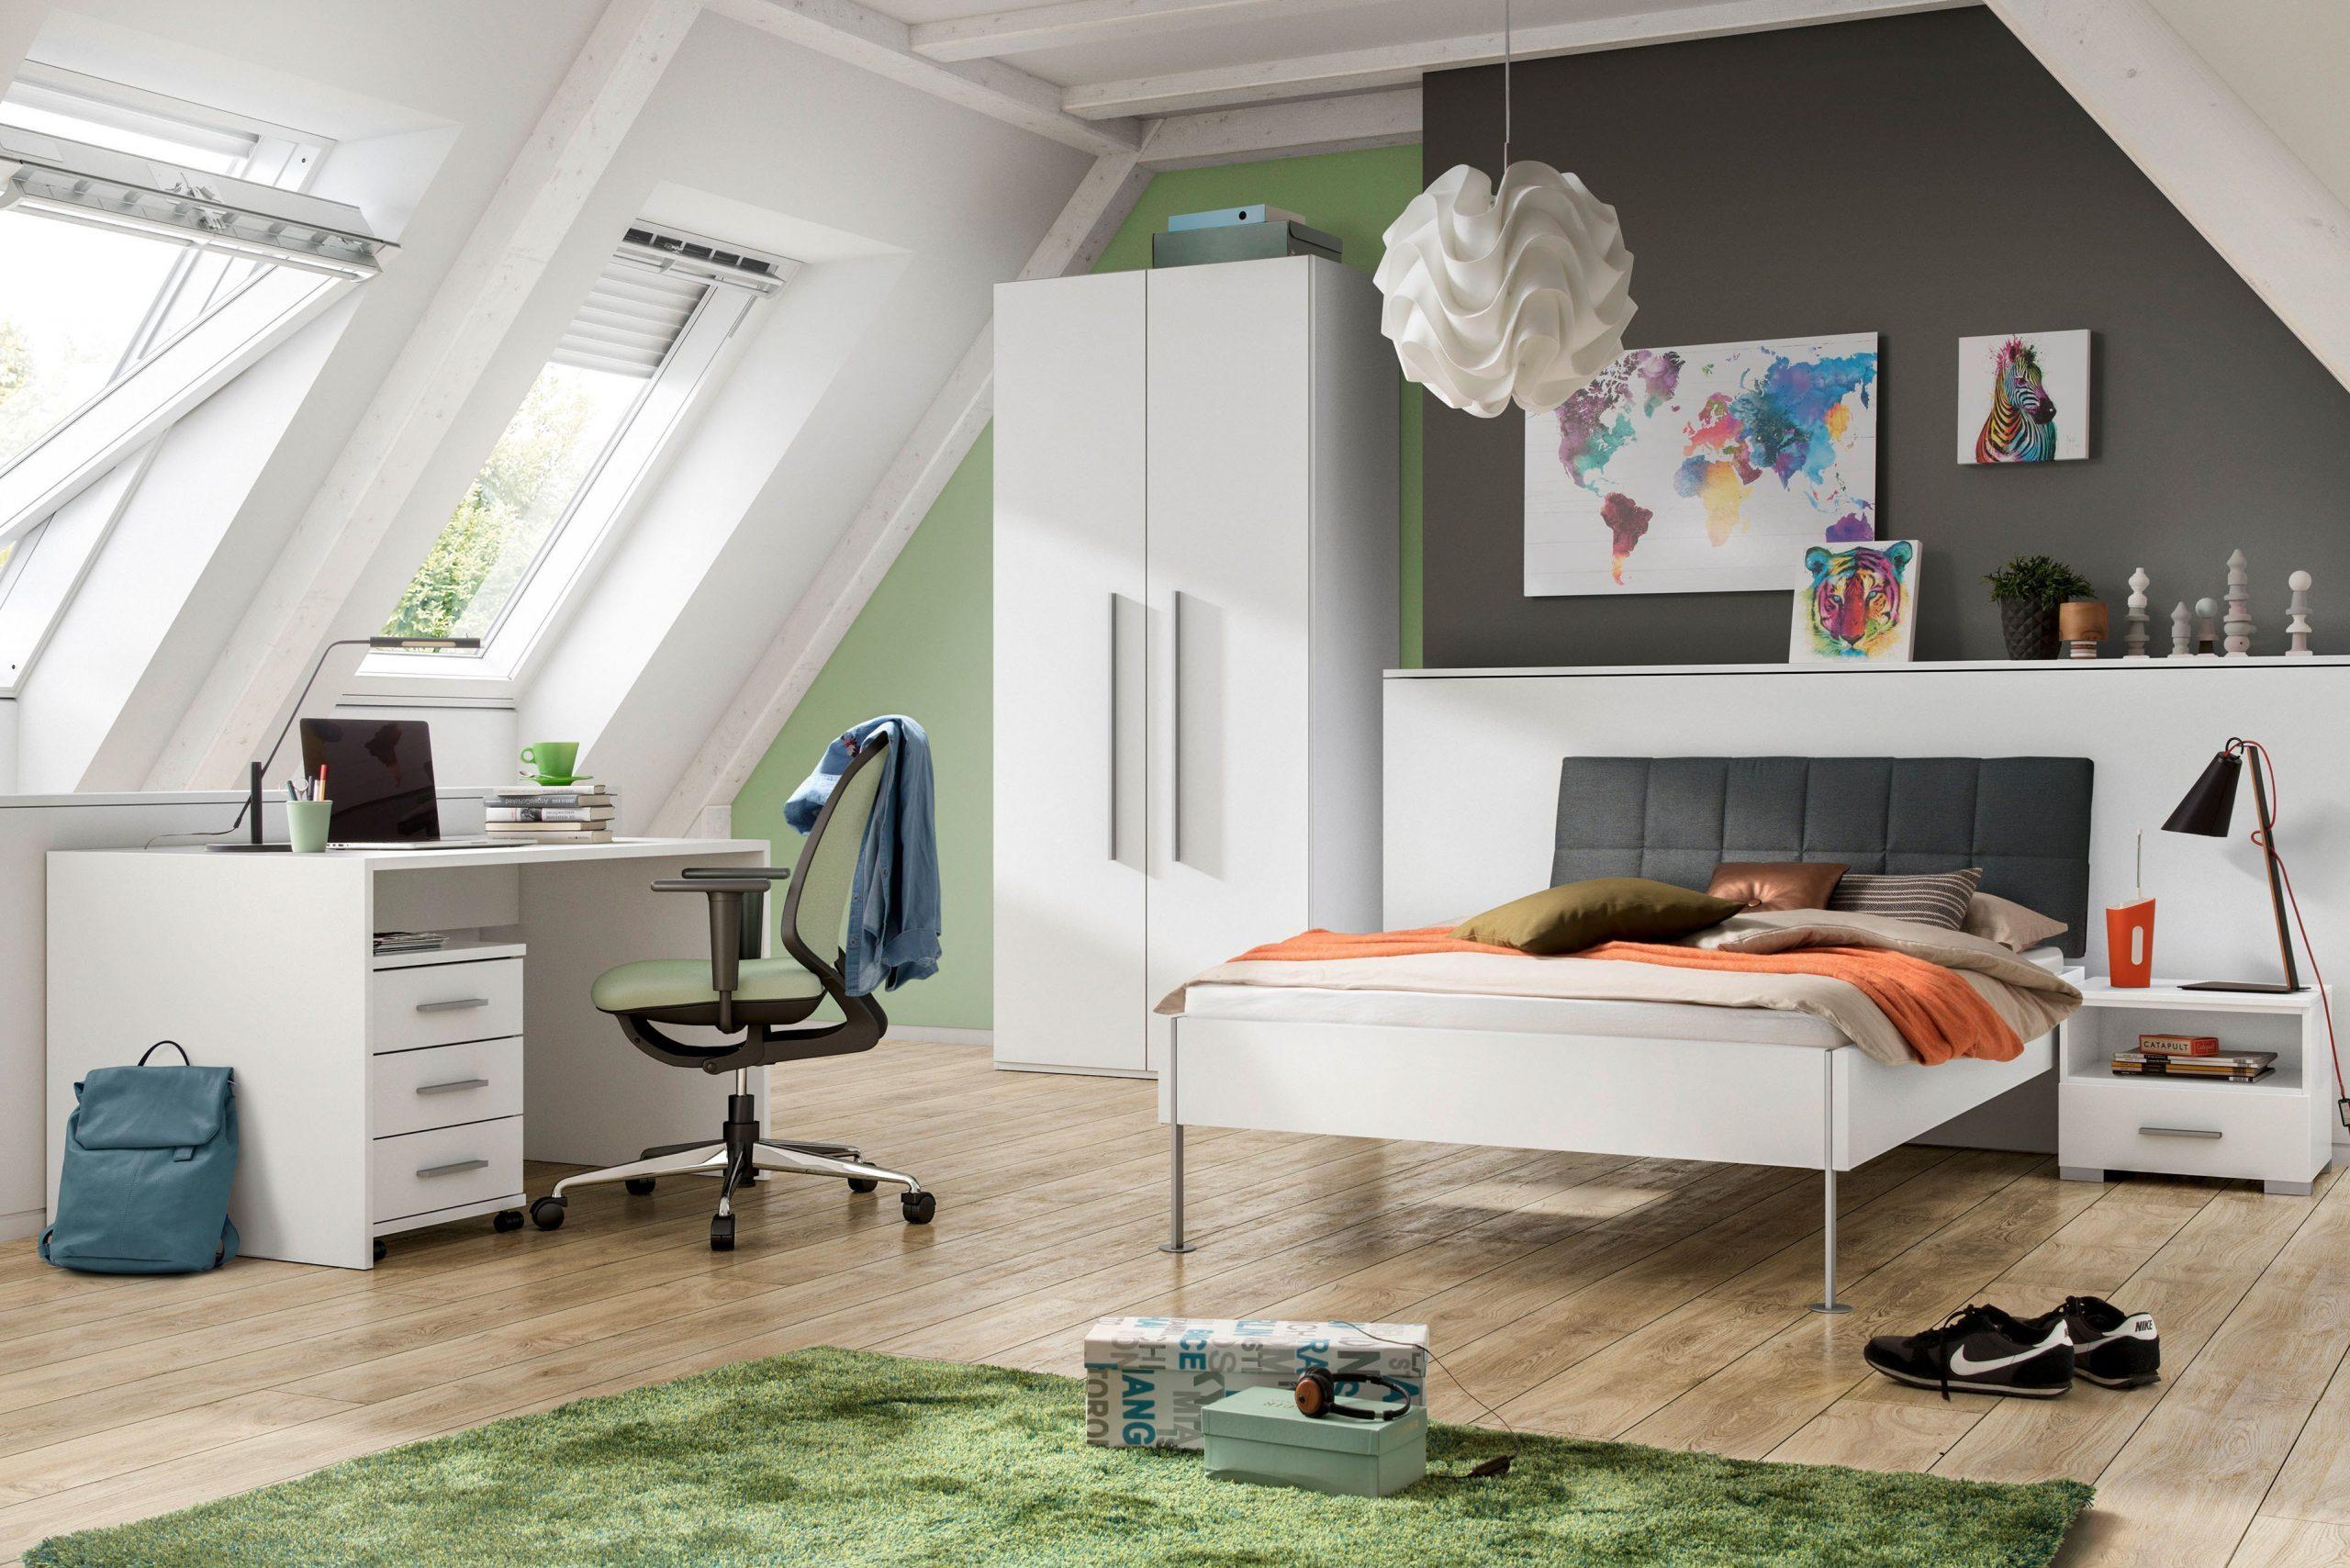 Full Size of Bett Schrank Kombination Ikea Schrankbett 180x200 Mit Sofa Schreibtisch Schrankwand 140x200 140 X 200 Vertikal Zwei Betten 160x200 Couch Selber Bauen Bett Bett Schrank